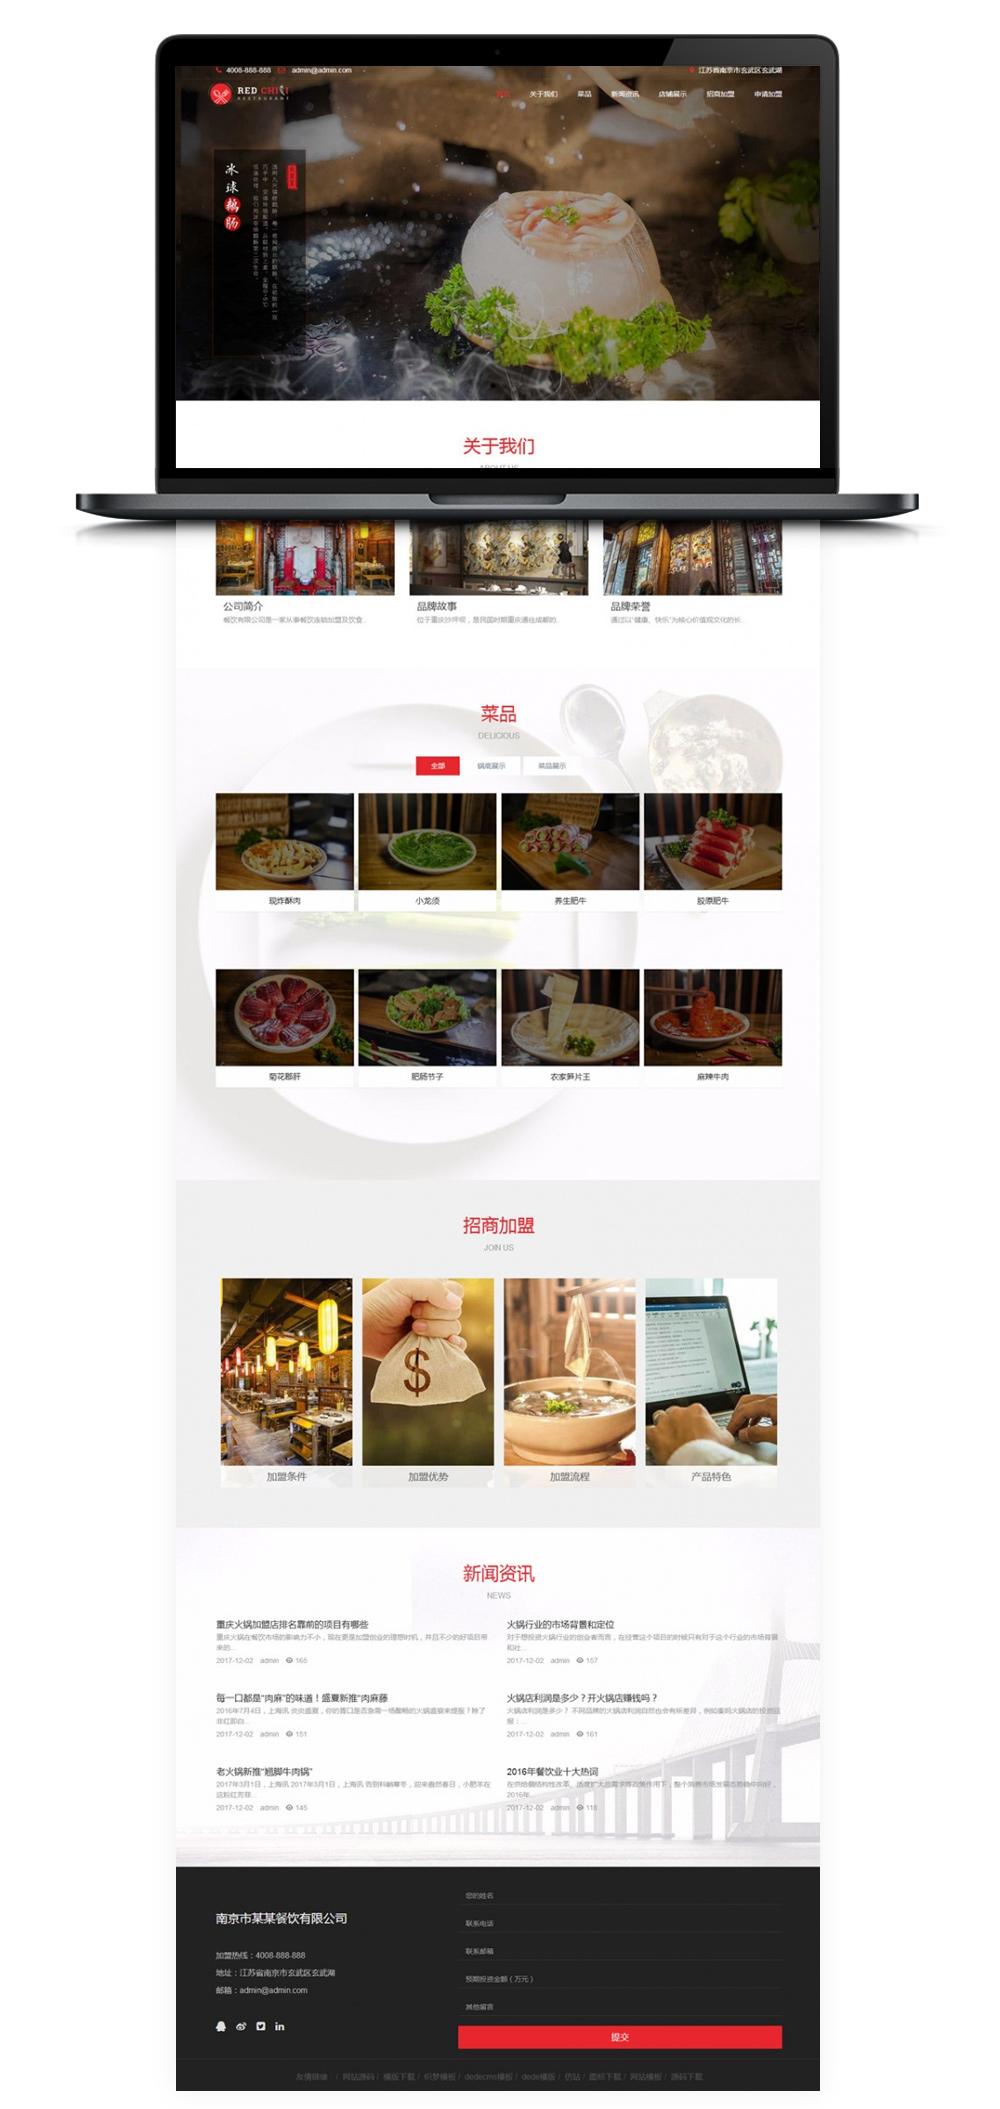 【DEDECMS模板】美食餐饮加盟管理企业网站HTML5模板[自适应手机WAP端]-酷网站源码